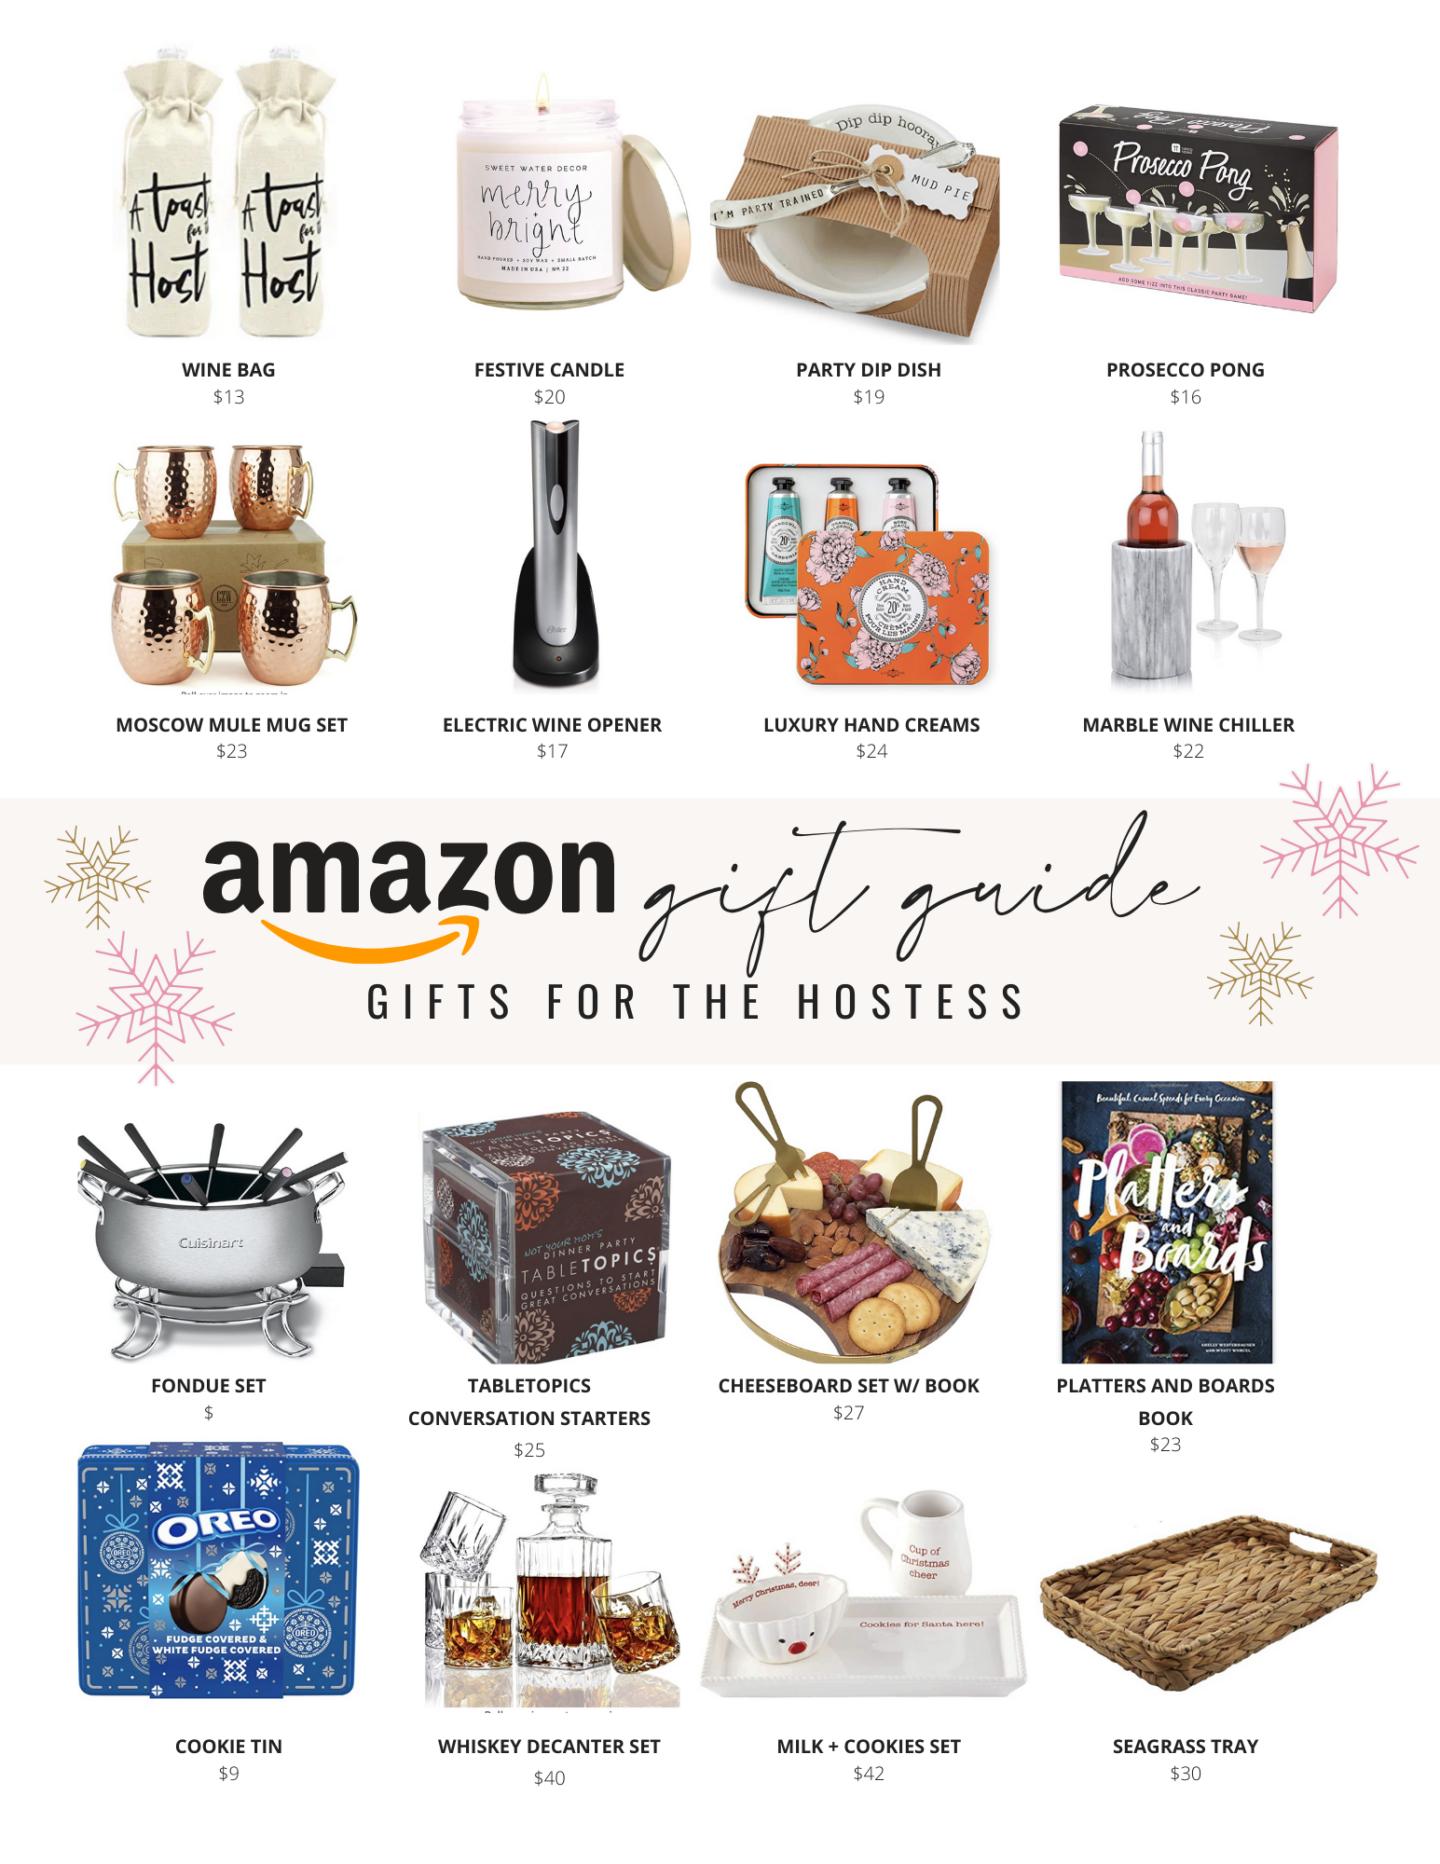 Best Amazon hostess gifts